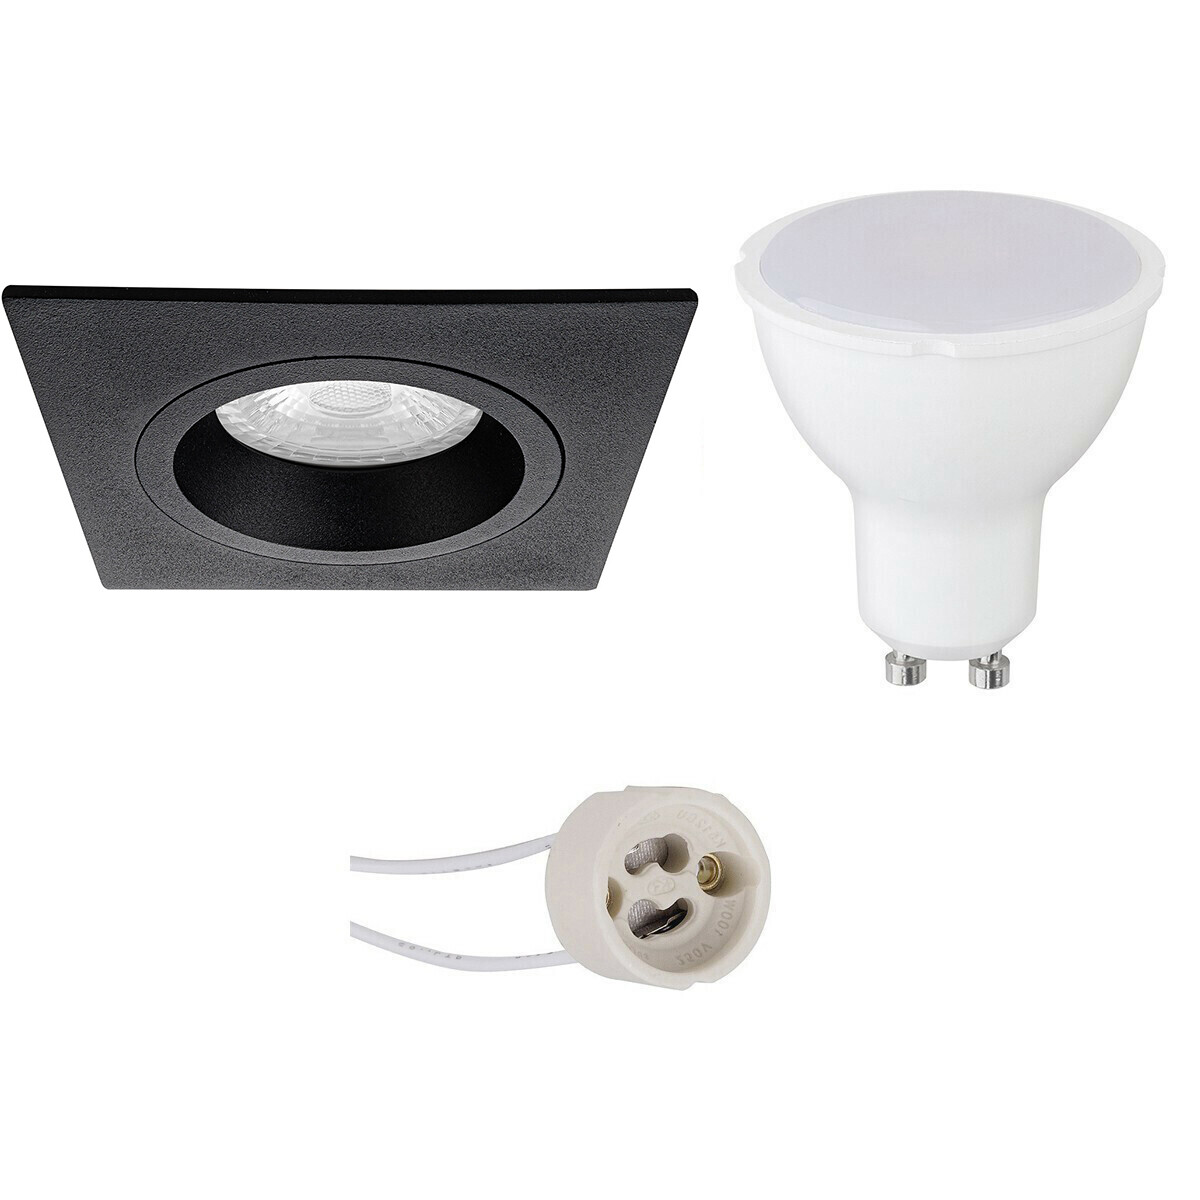 LED Spot Set - Pragmi Rodos Pro - GU10 Fitting - Dimbaar - Inbouw Vierkant - Mat Zwart - 6W - Warm W